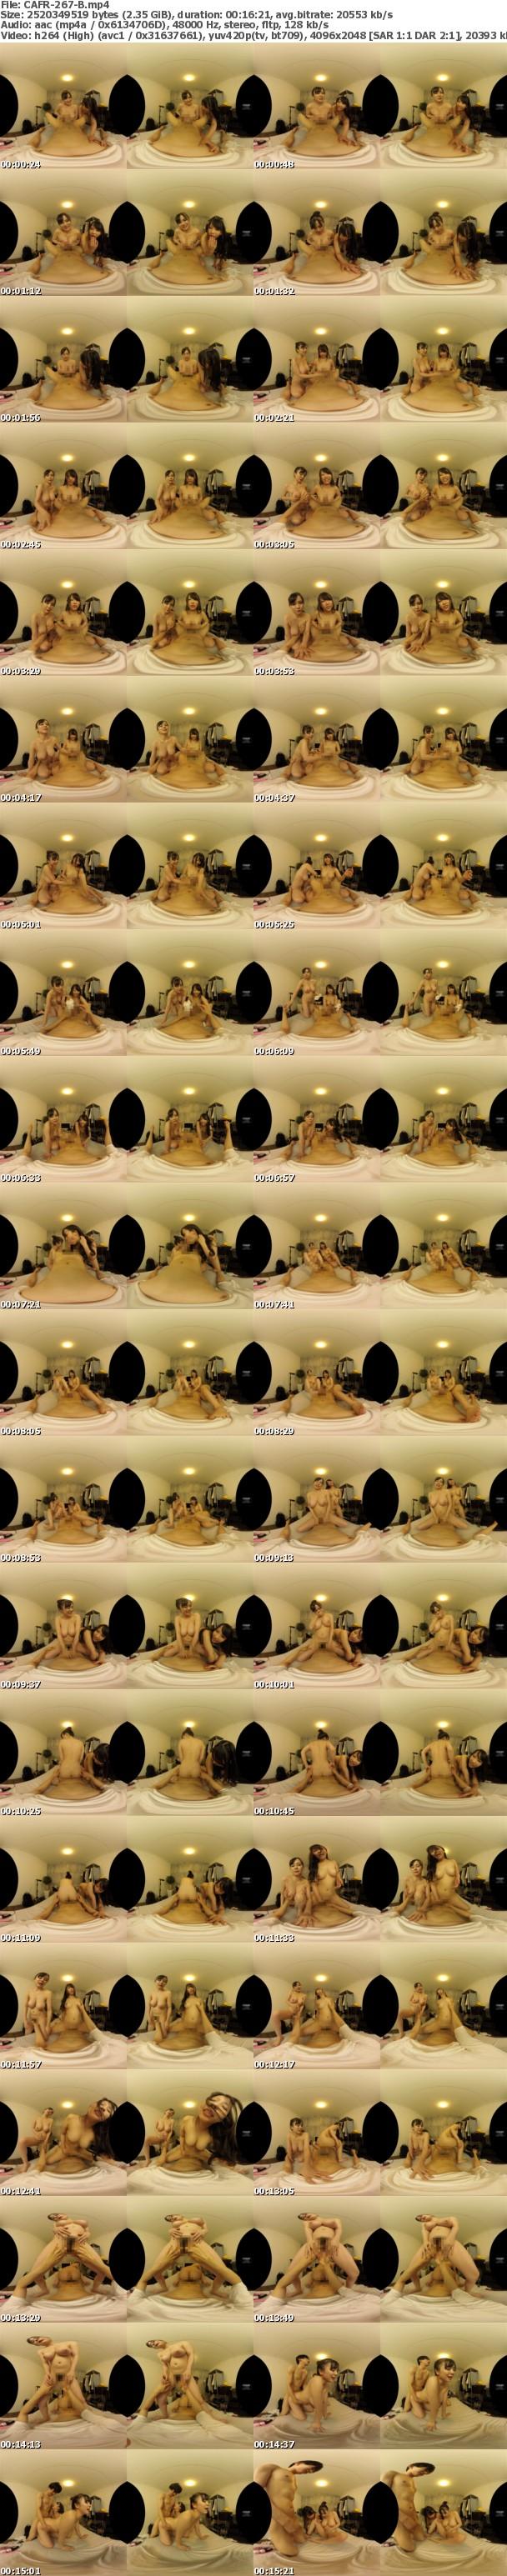 (VR) CAFR-267 HQ高画質対応 ナンパした女を連れ込み言葉巧みにVRで撮影。個人的に楽しむなんて嘘に決まってるwww VRハメ撮り師な俺が撮った映像放出 vol.18